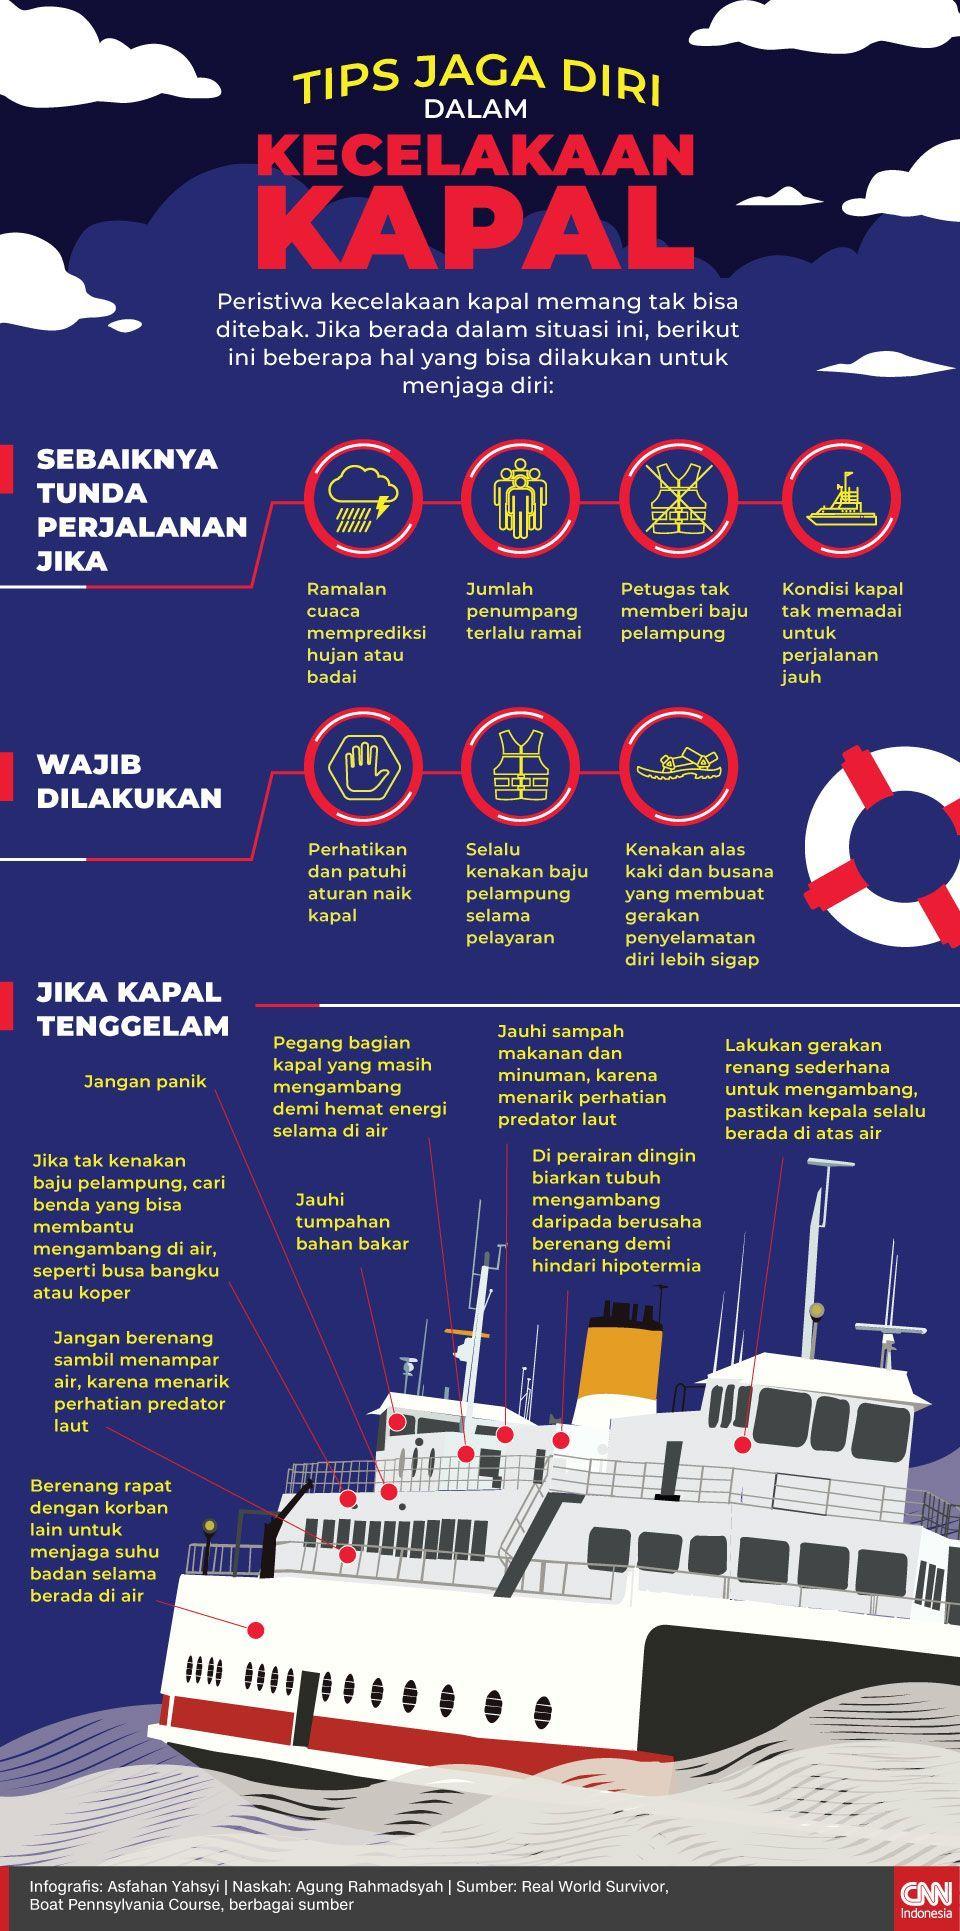 Infografis Tips Jaga Diri dalam Kecelakaan Kapal